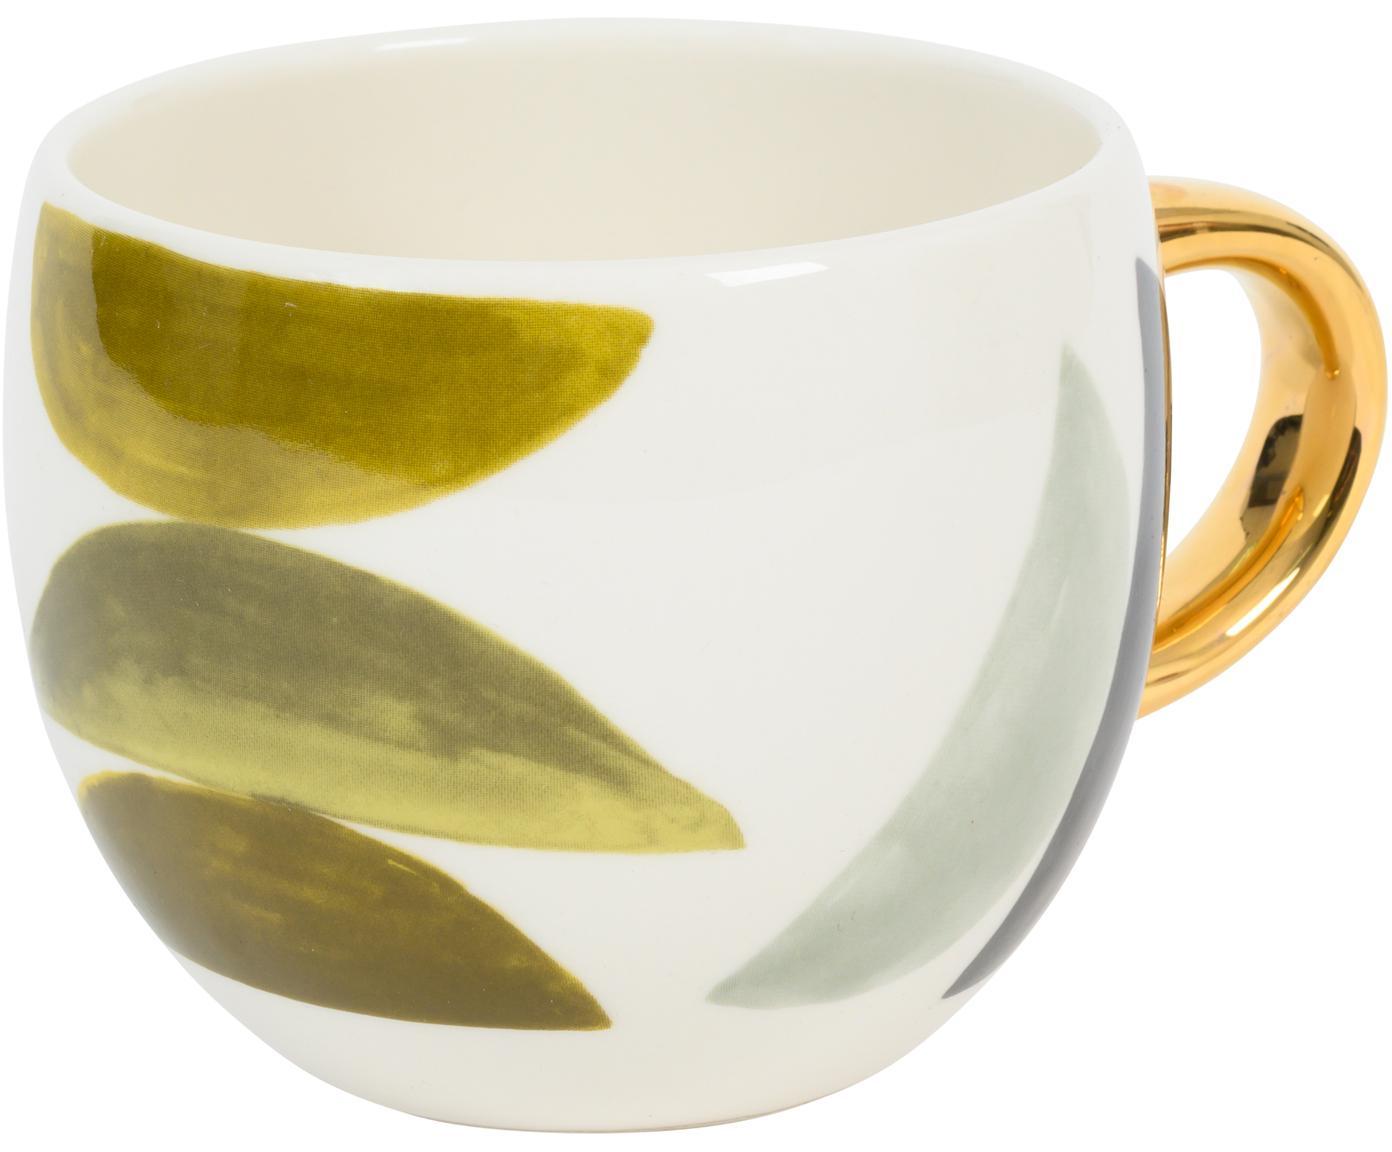 Bemalte Tasse Boomerang mit goldenem Griff, Steingut, Mehrfarbig, Ø 11 x H 9 cm